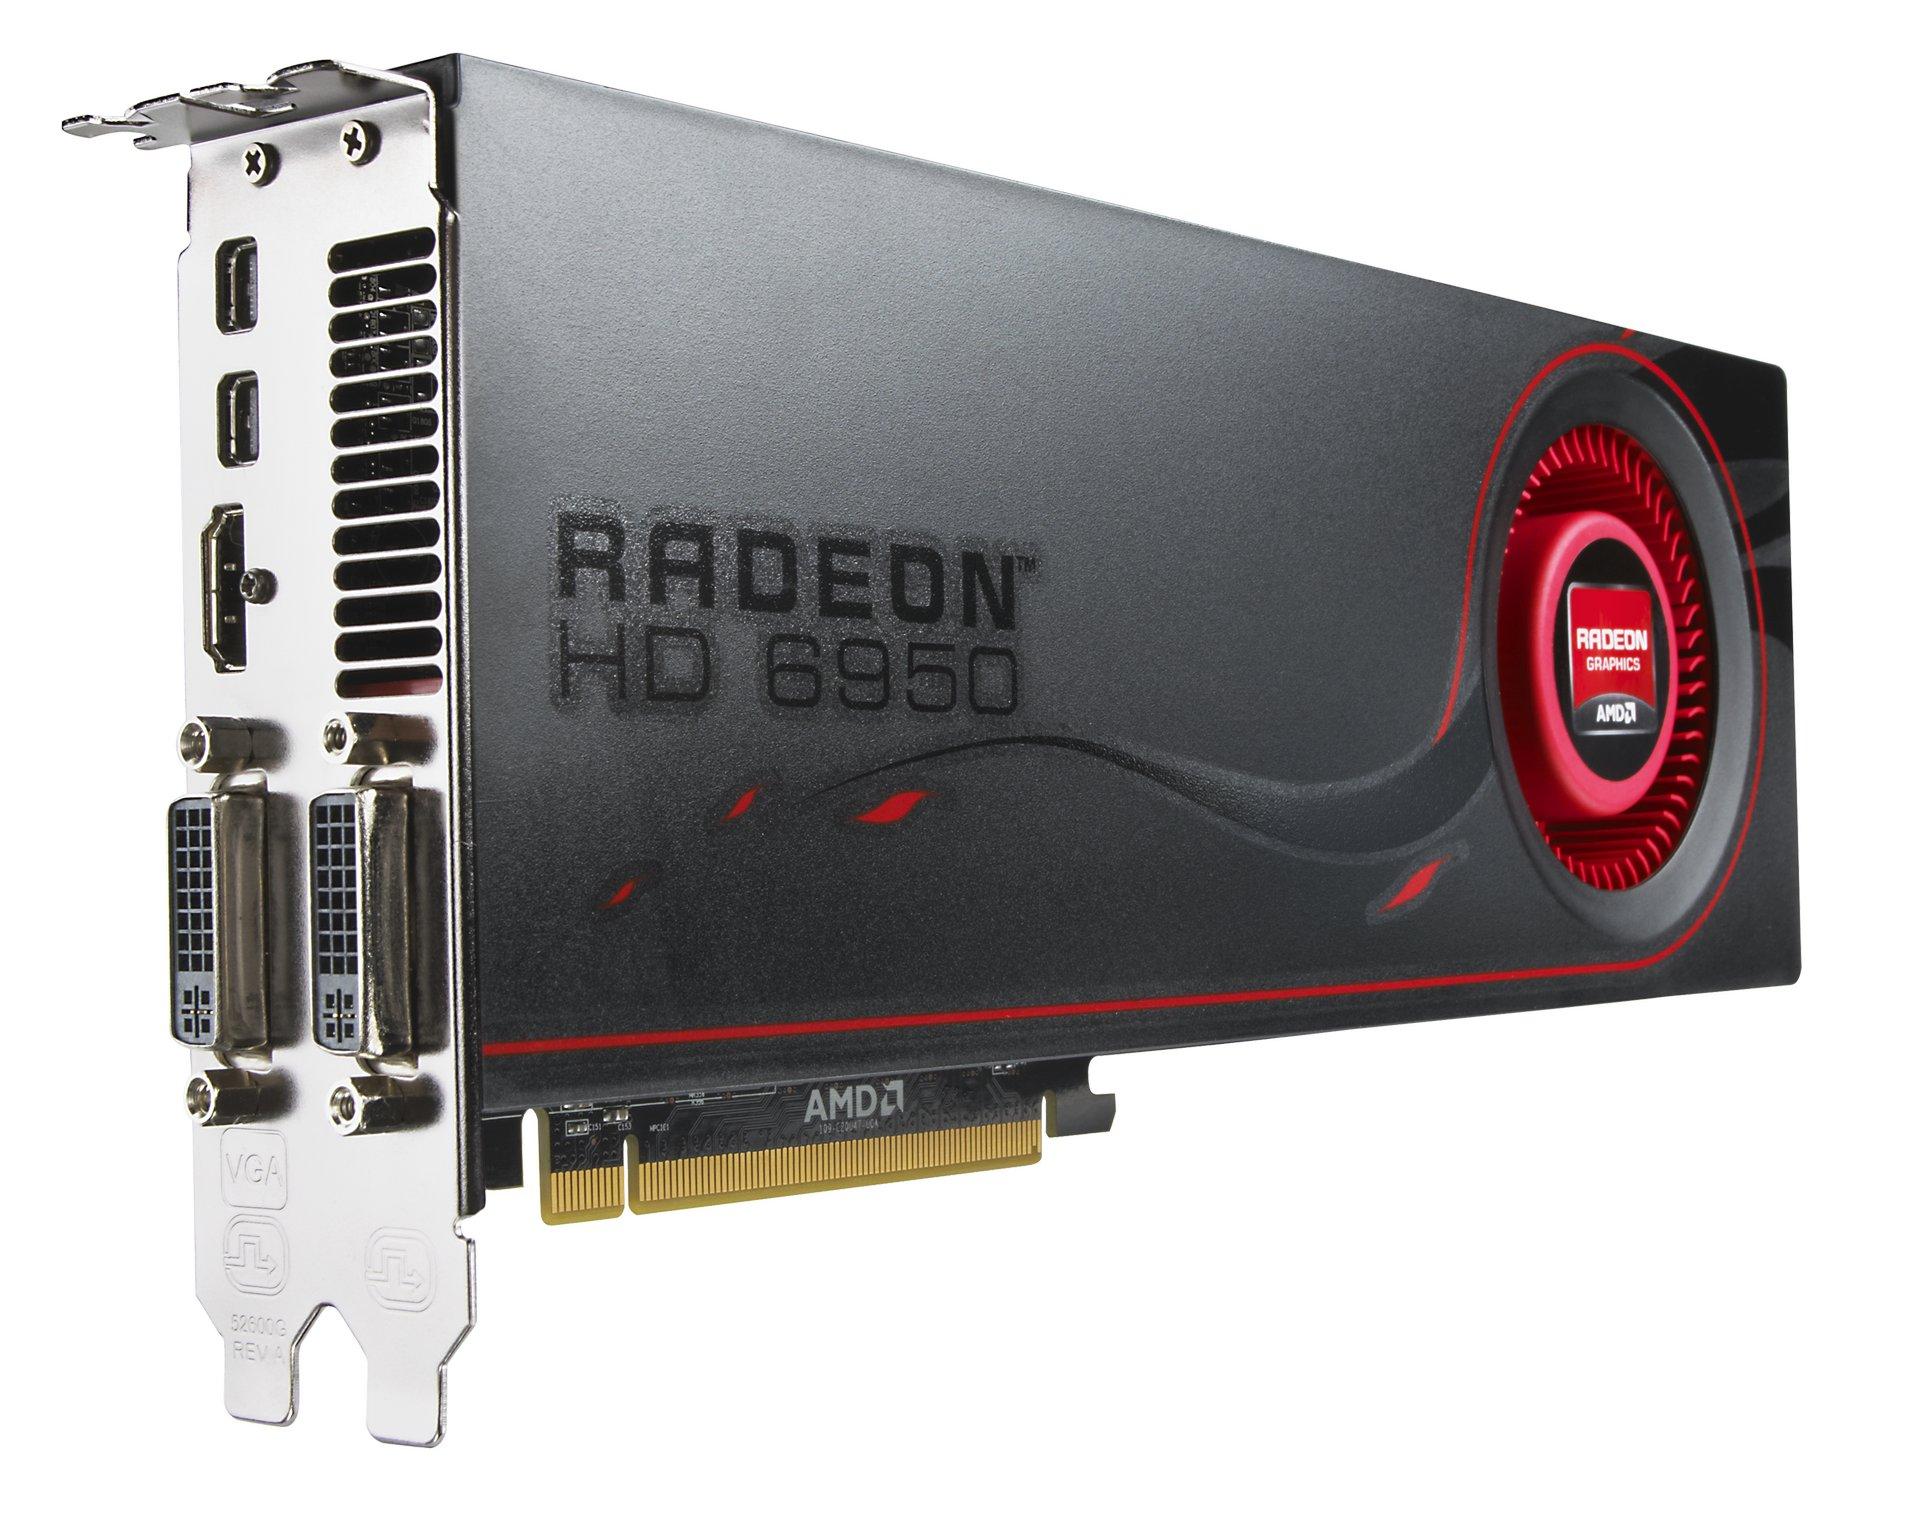 amd-radeon-hd_AMD Radeon HD 6900 (AMD Cayman) series graphics cards | en.hw-lab.com